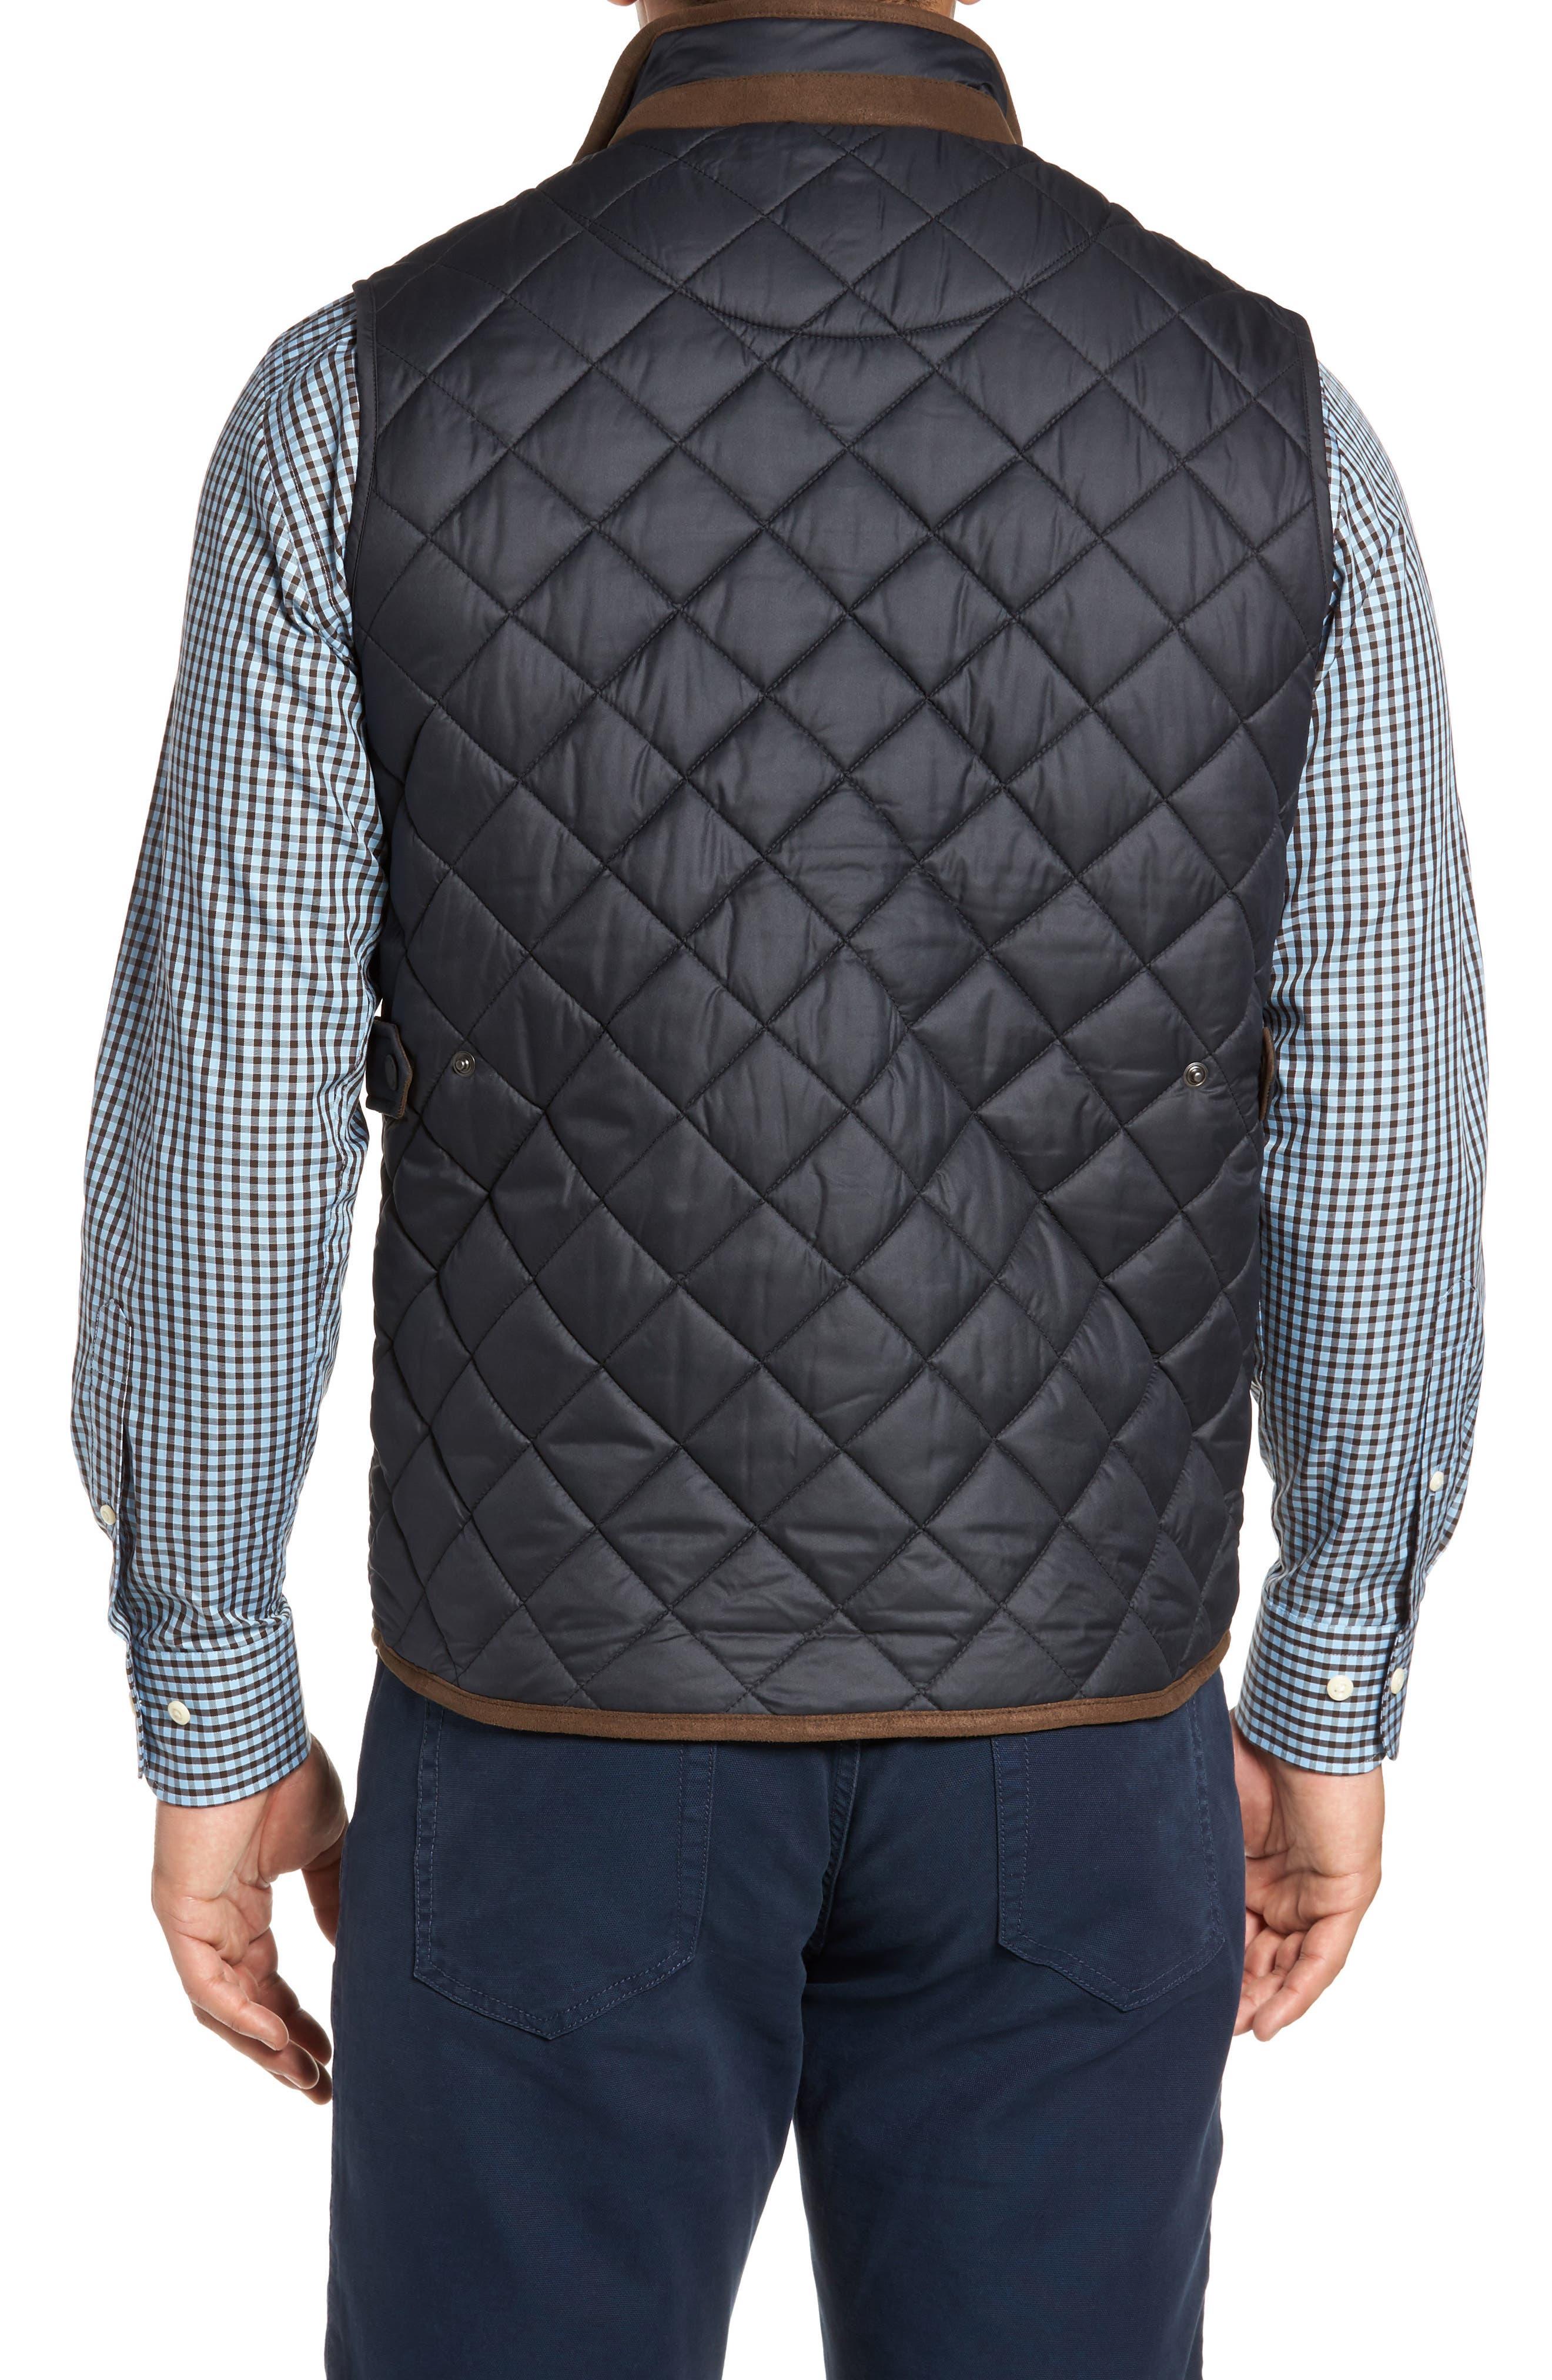 Essex Quilted Vest,                             Alternate thumbnail 2, color,                             BLACK / BLACK